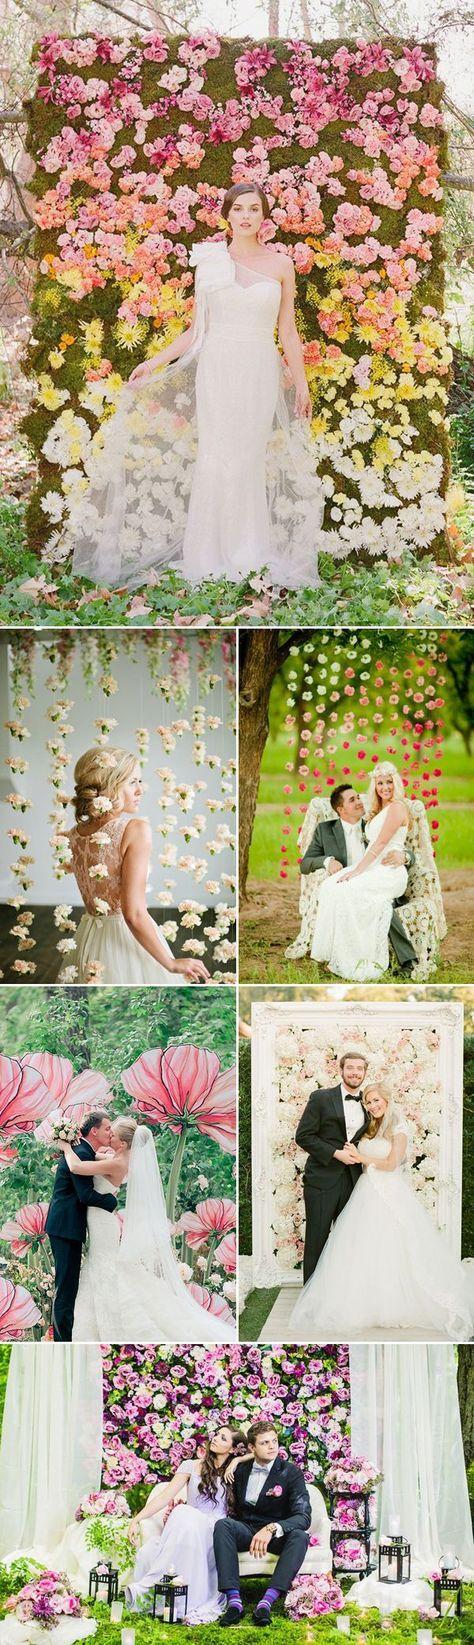 Wedding decor Ideas-Floral Wedding Backdrop